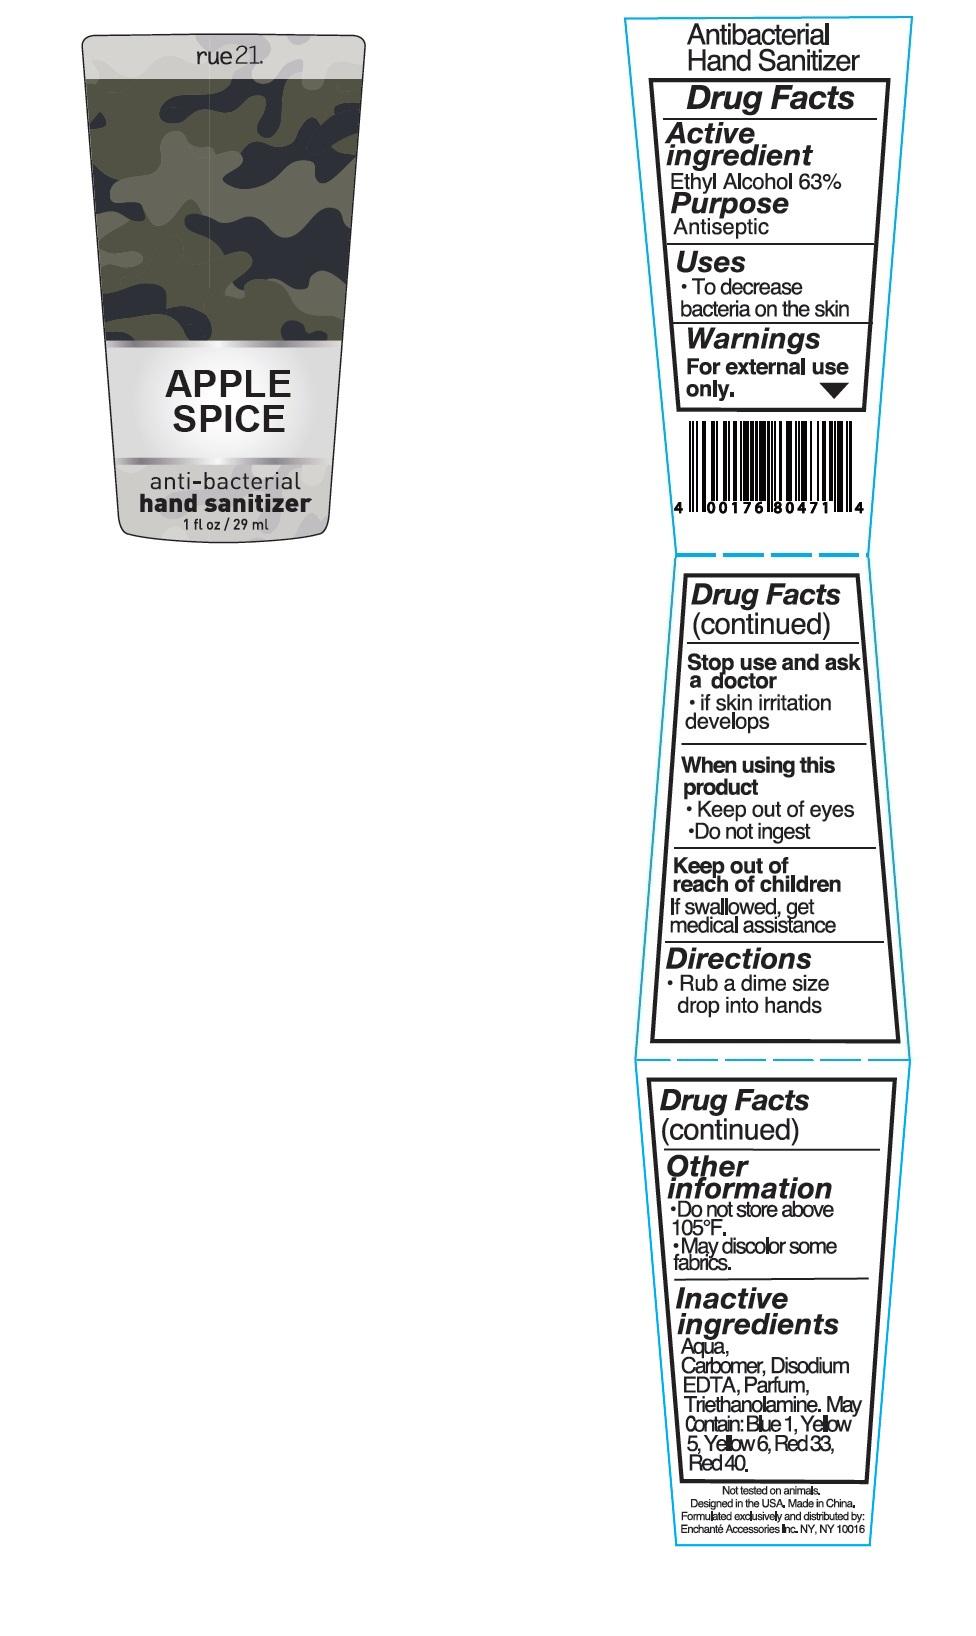 Rue21 Apple Spice Antibacterial Hand Sanitizer (Alcohol) Liquid [Enchante Accessories Inc. ]